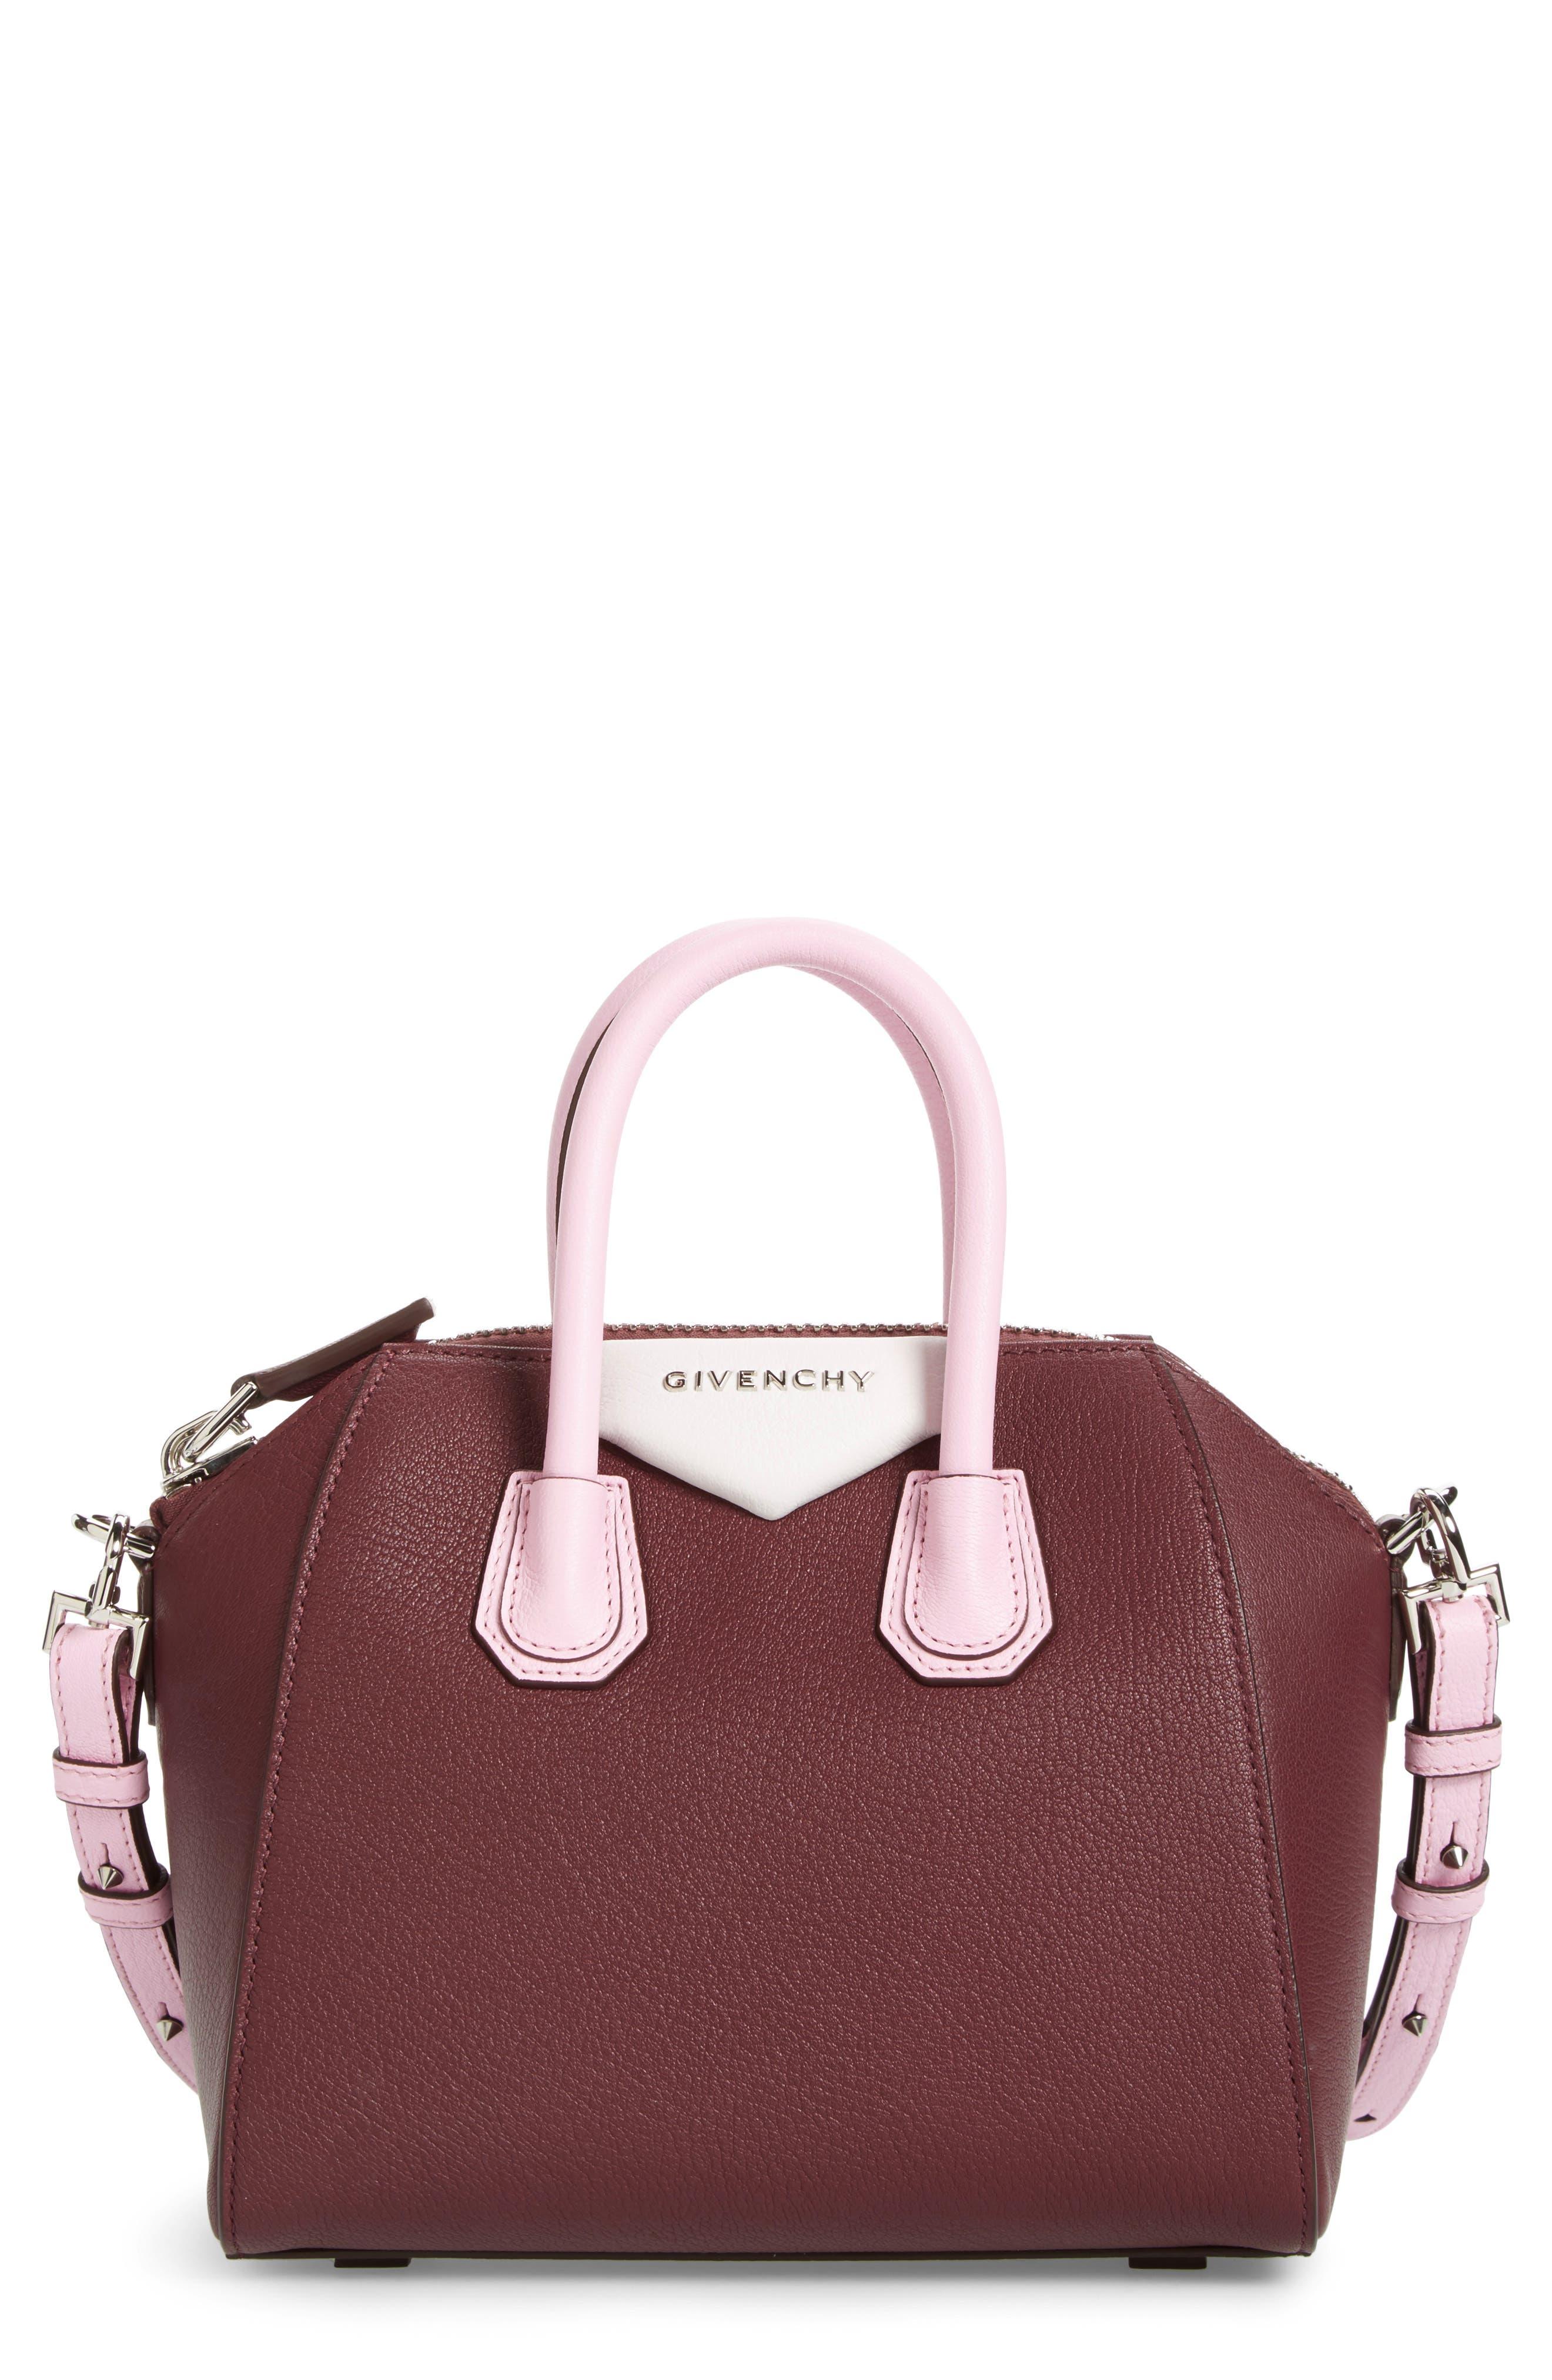 Alternate Image 1 Selected - Givenchy Mini Antigona Leather Top Handle Satchel